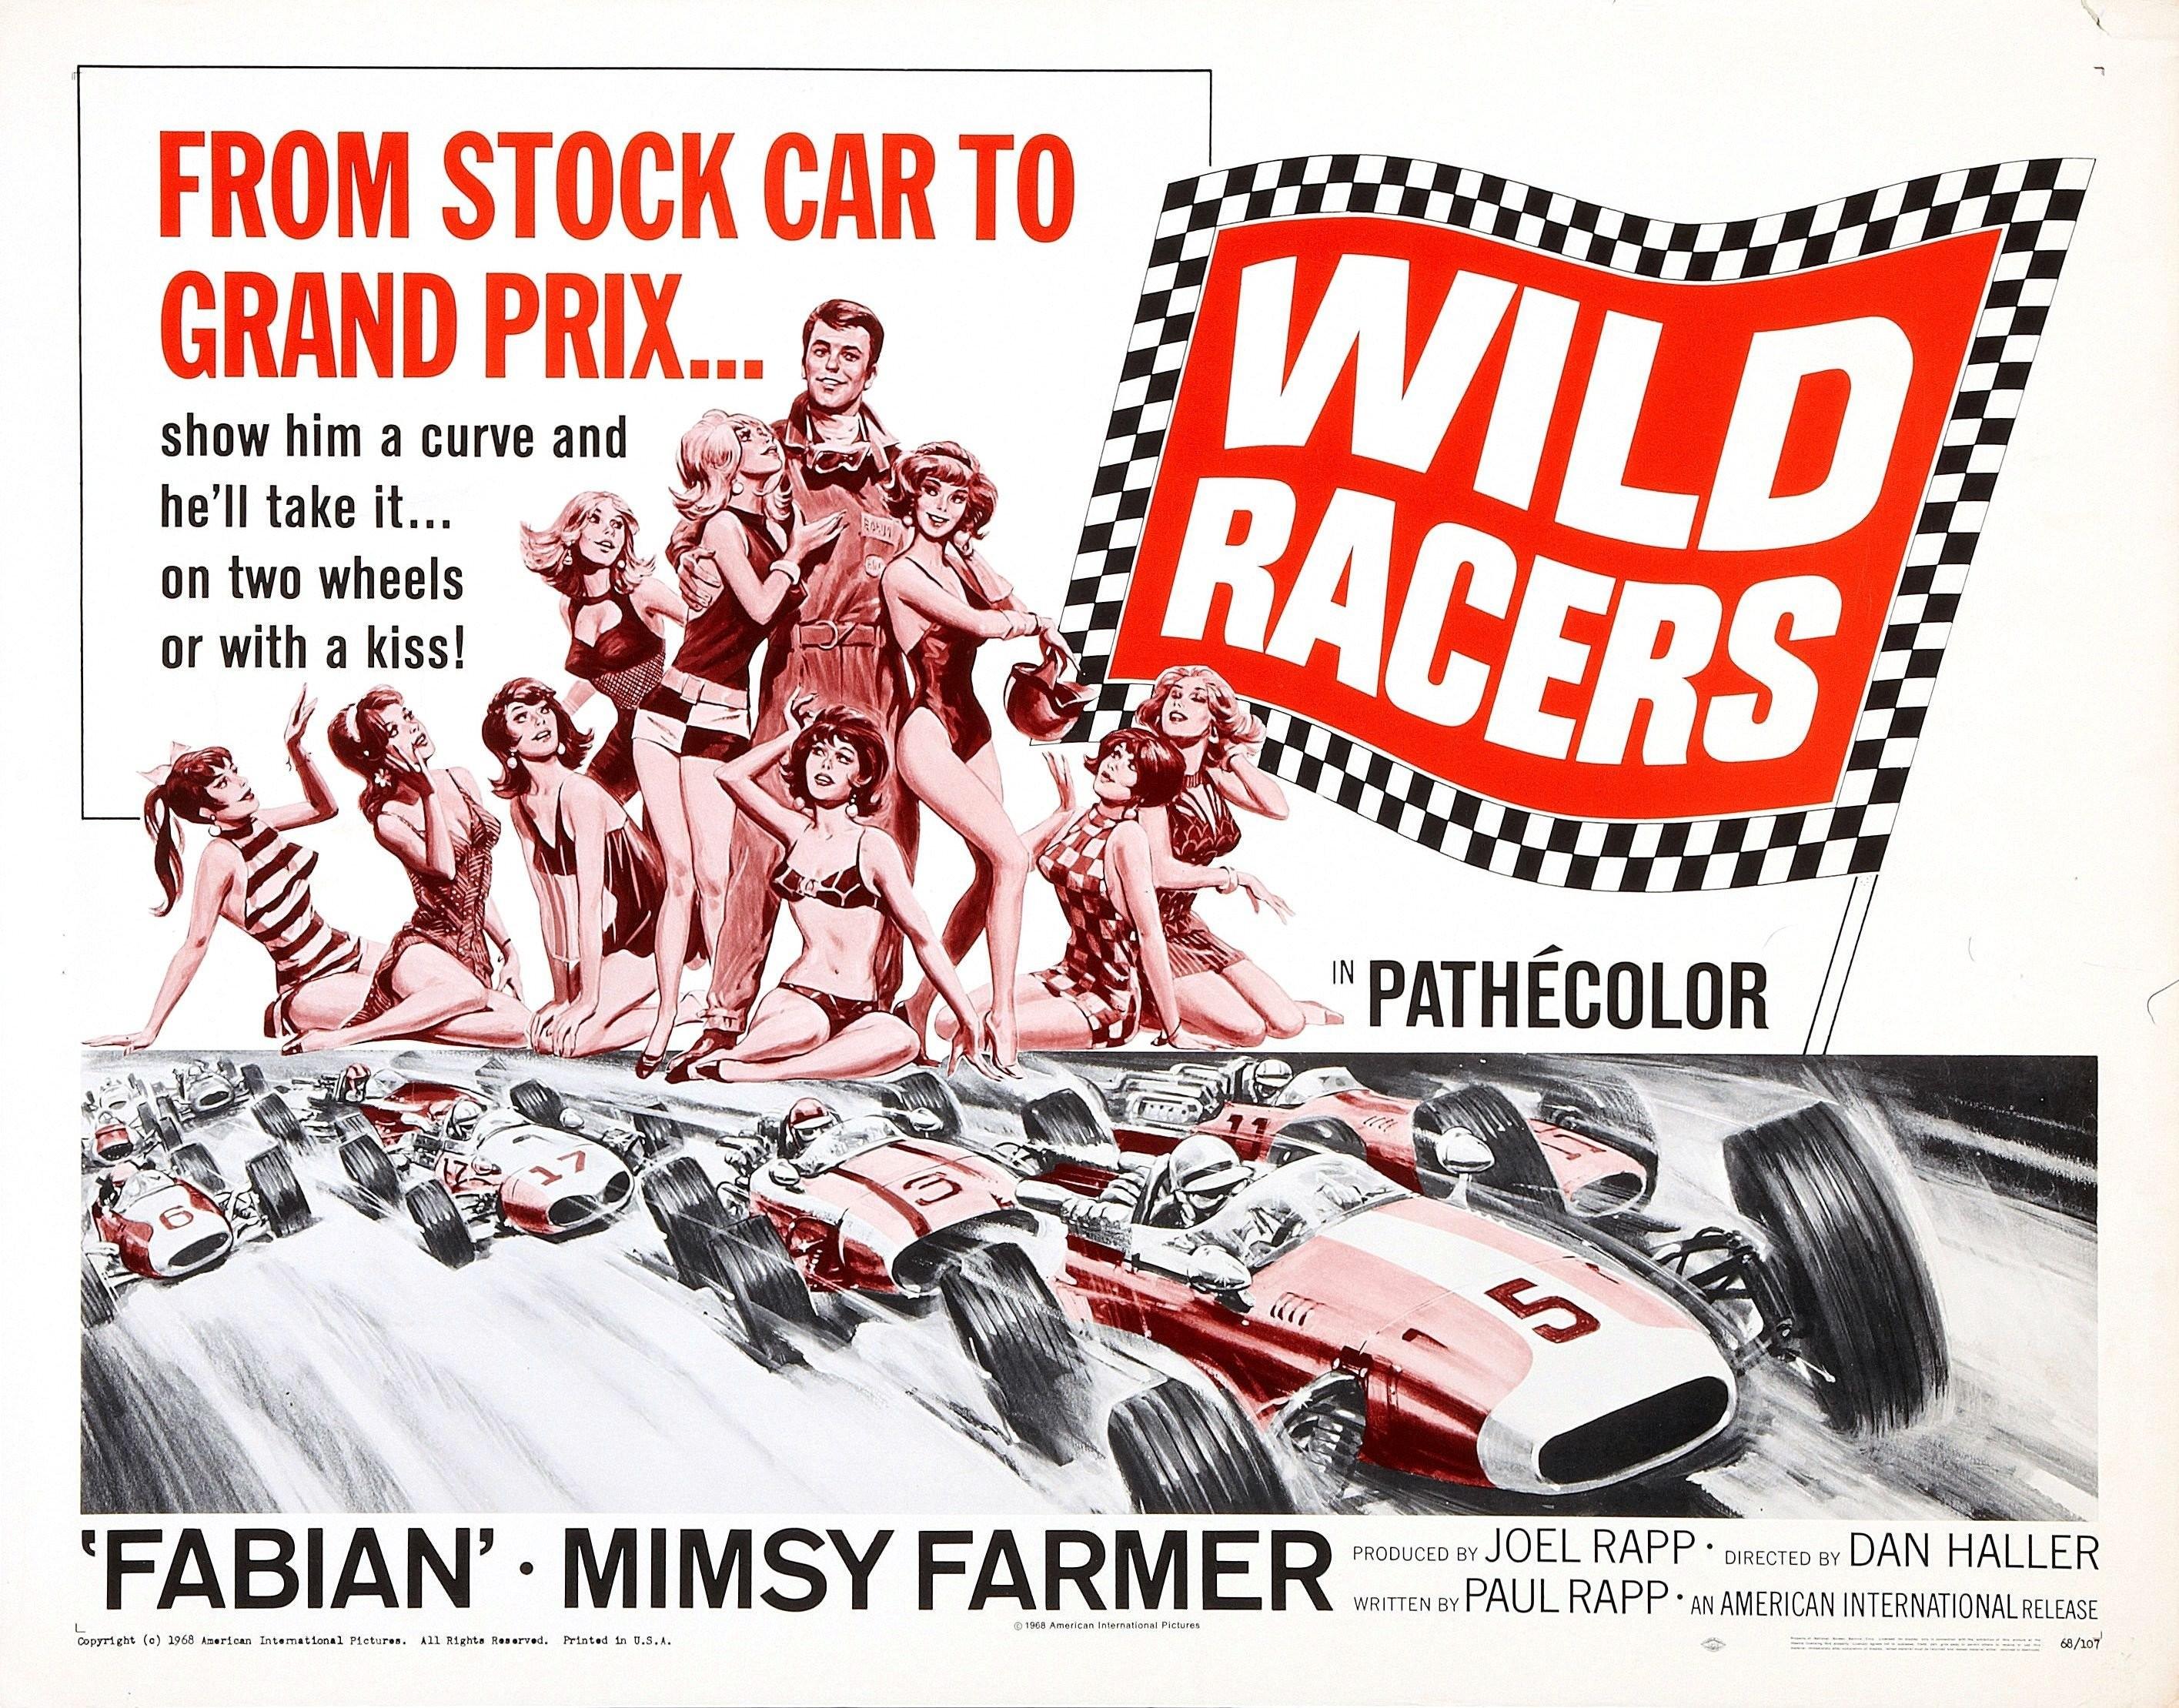 Movies Retro Vintage Cinema Wallpaper Iphone Movie Sign 2831x2219